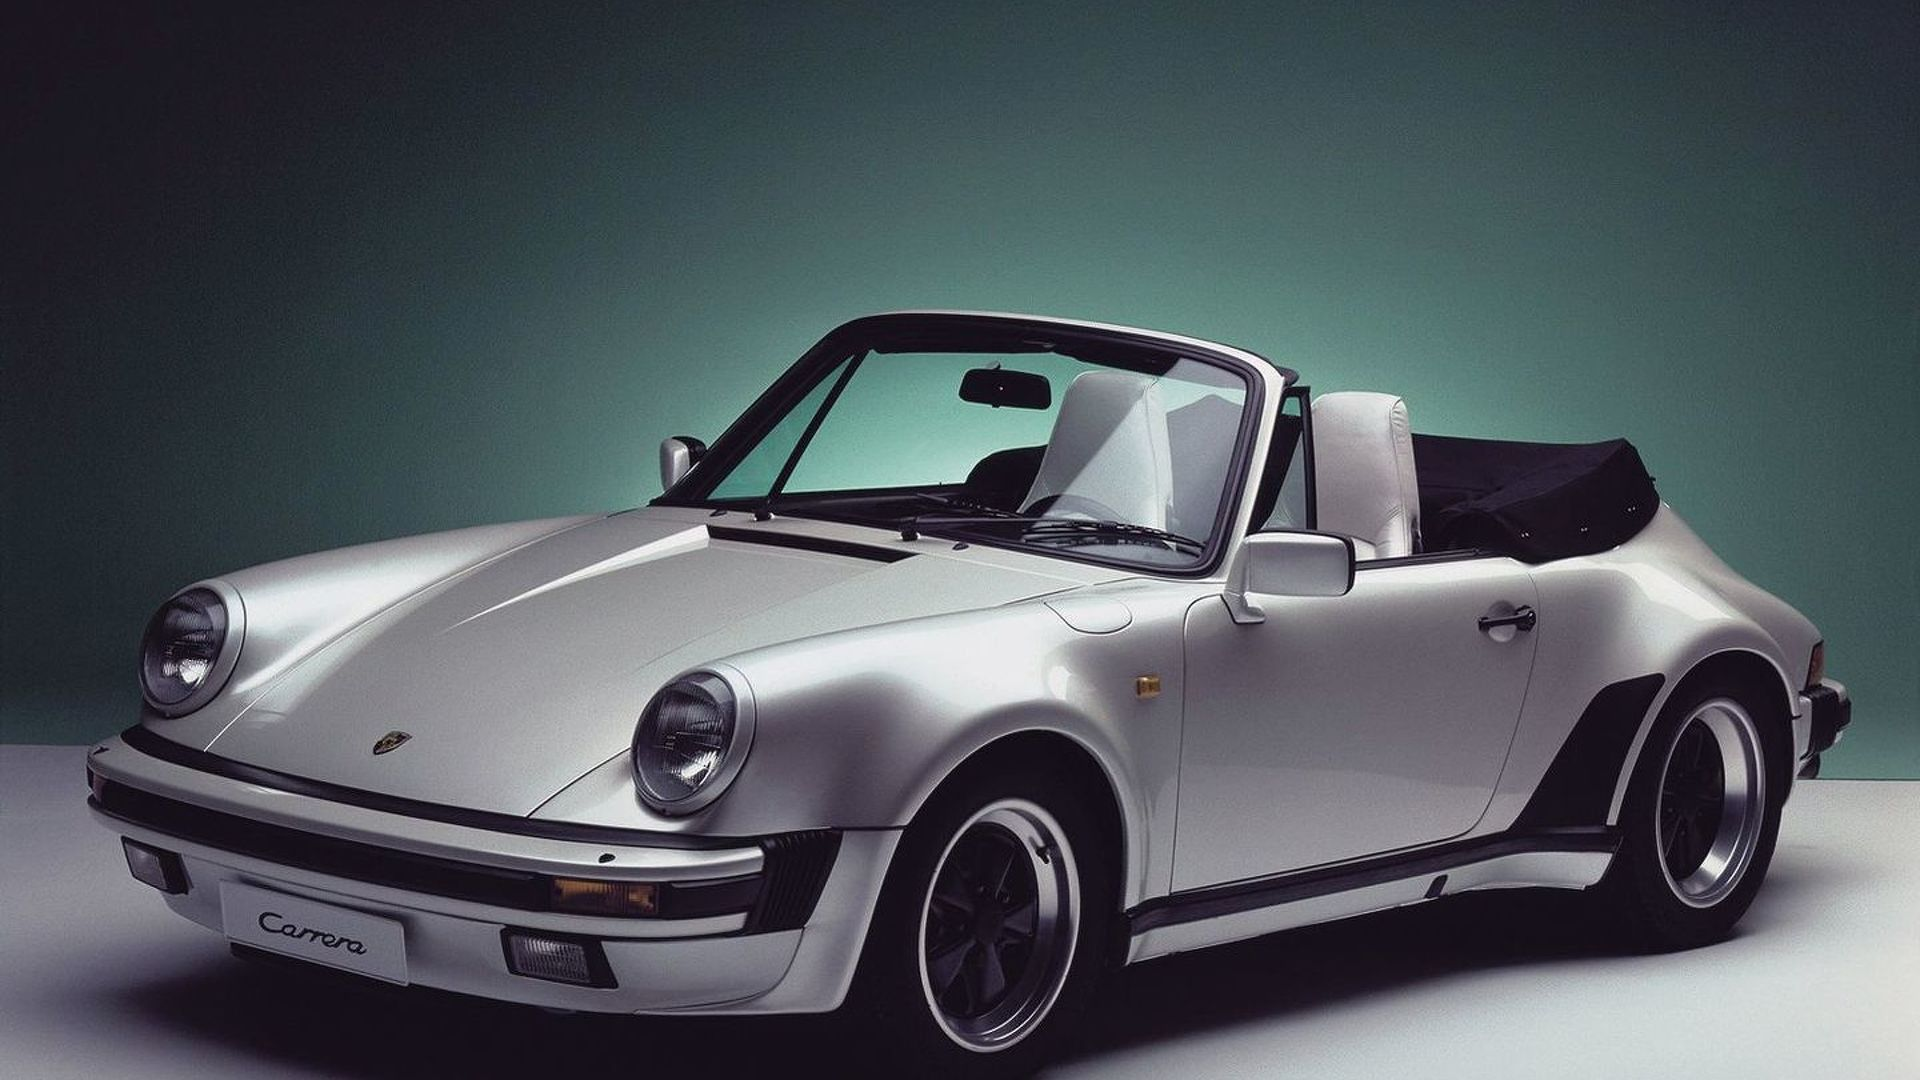 Porsche 911 Carrera 4S-based widebody Supersport in the works?